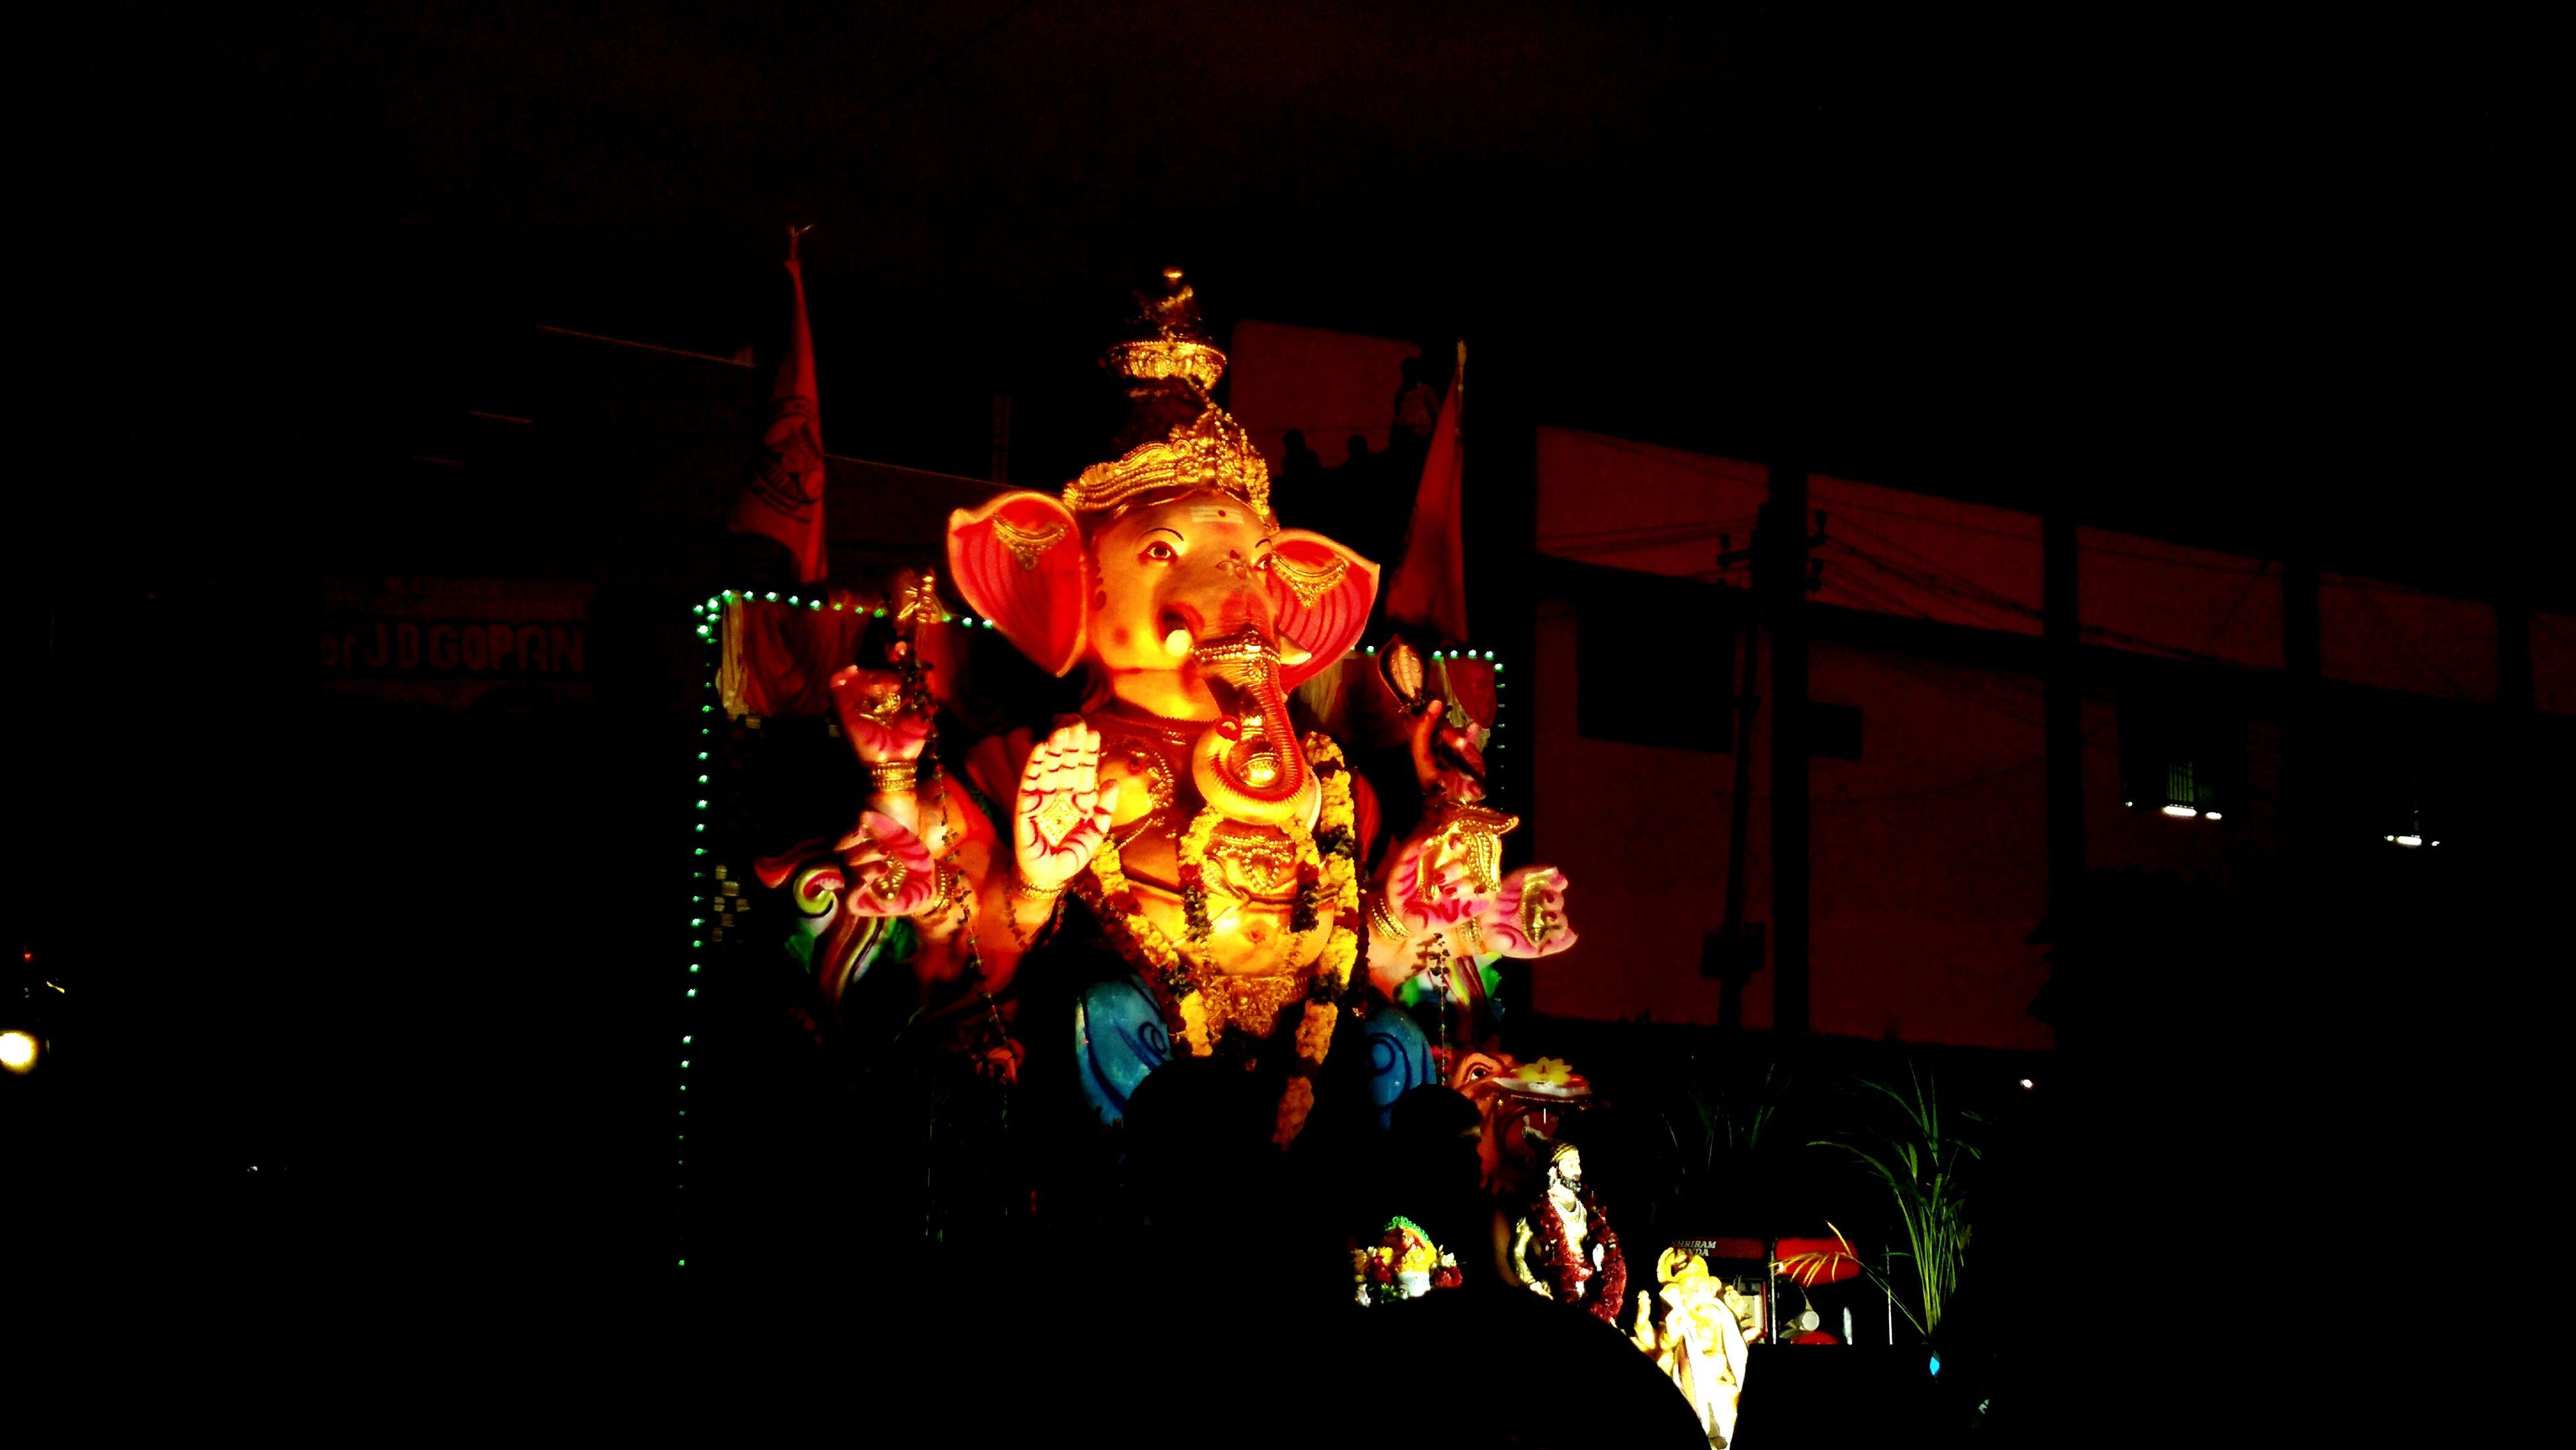 human representation, low angle view, illuminated, tradition, religion, celebration, spirituality, lantern, cultures, night, place of worship, decoration, culture, creativity, orange color